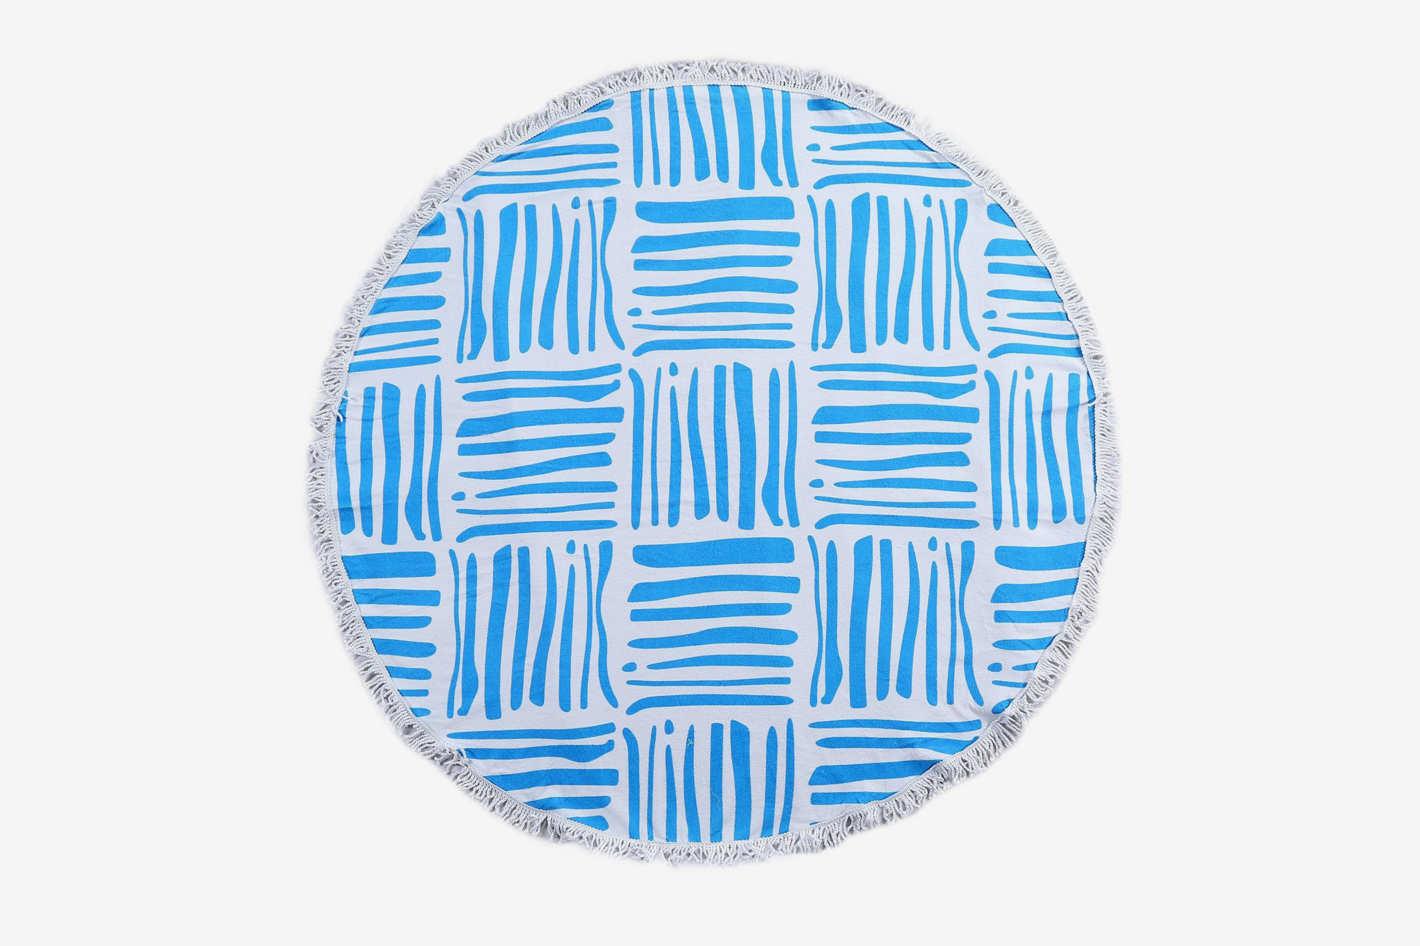 ShengChun Round Beach Towel Cotton Microfiber Blend Extra Large Oversized With Fringe Tassel